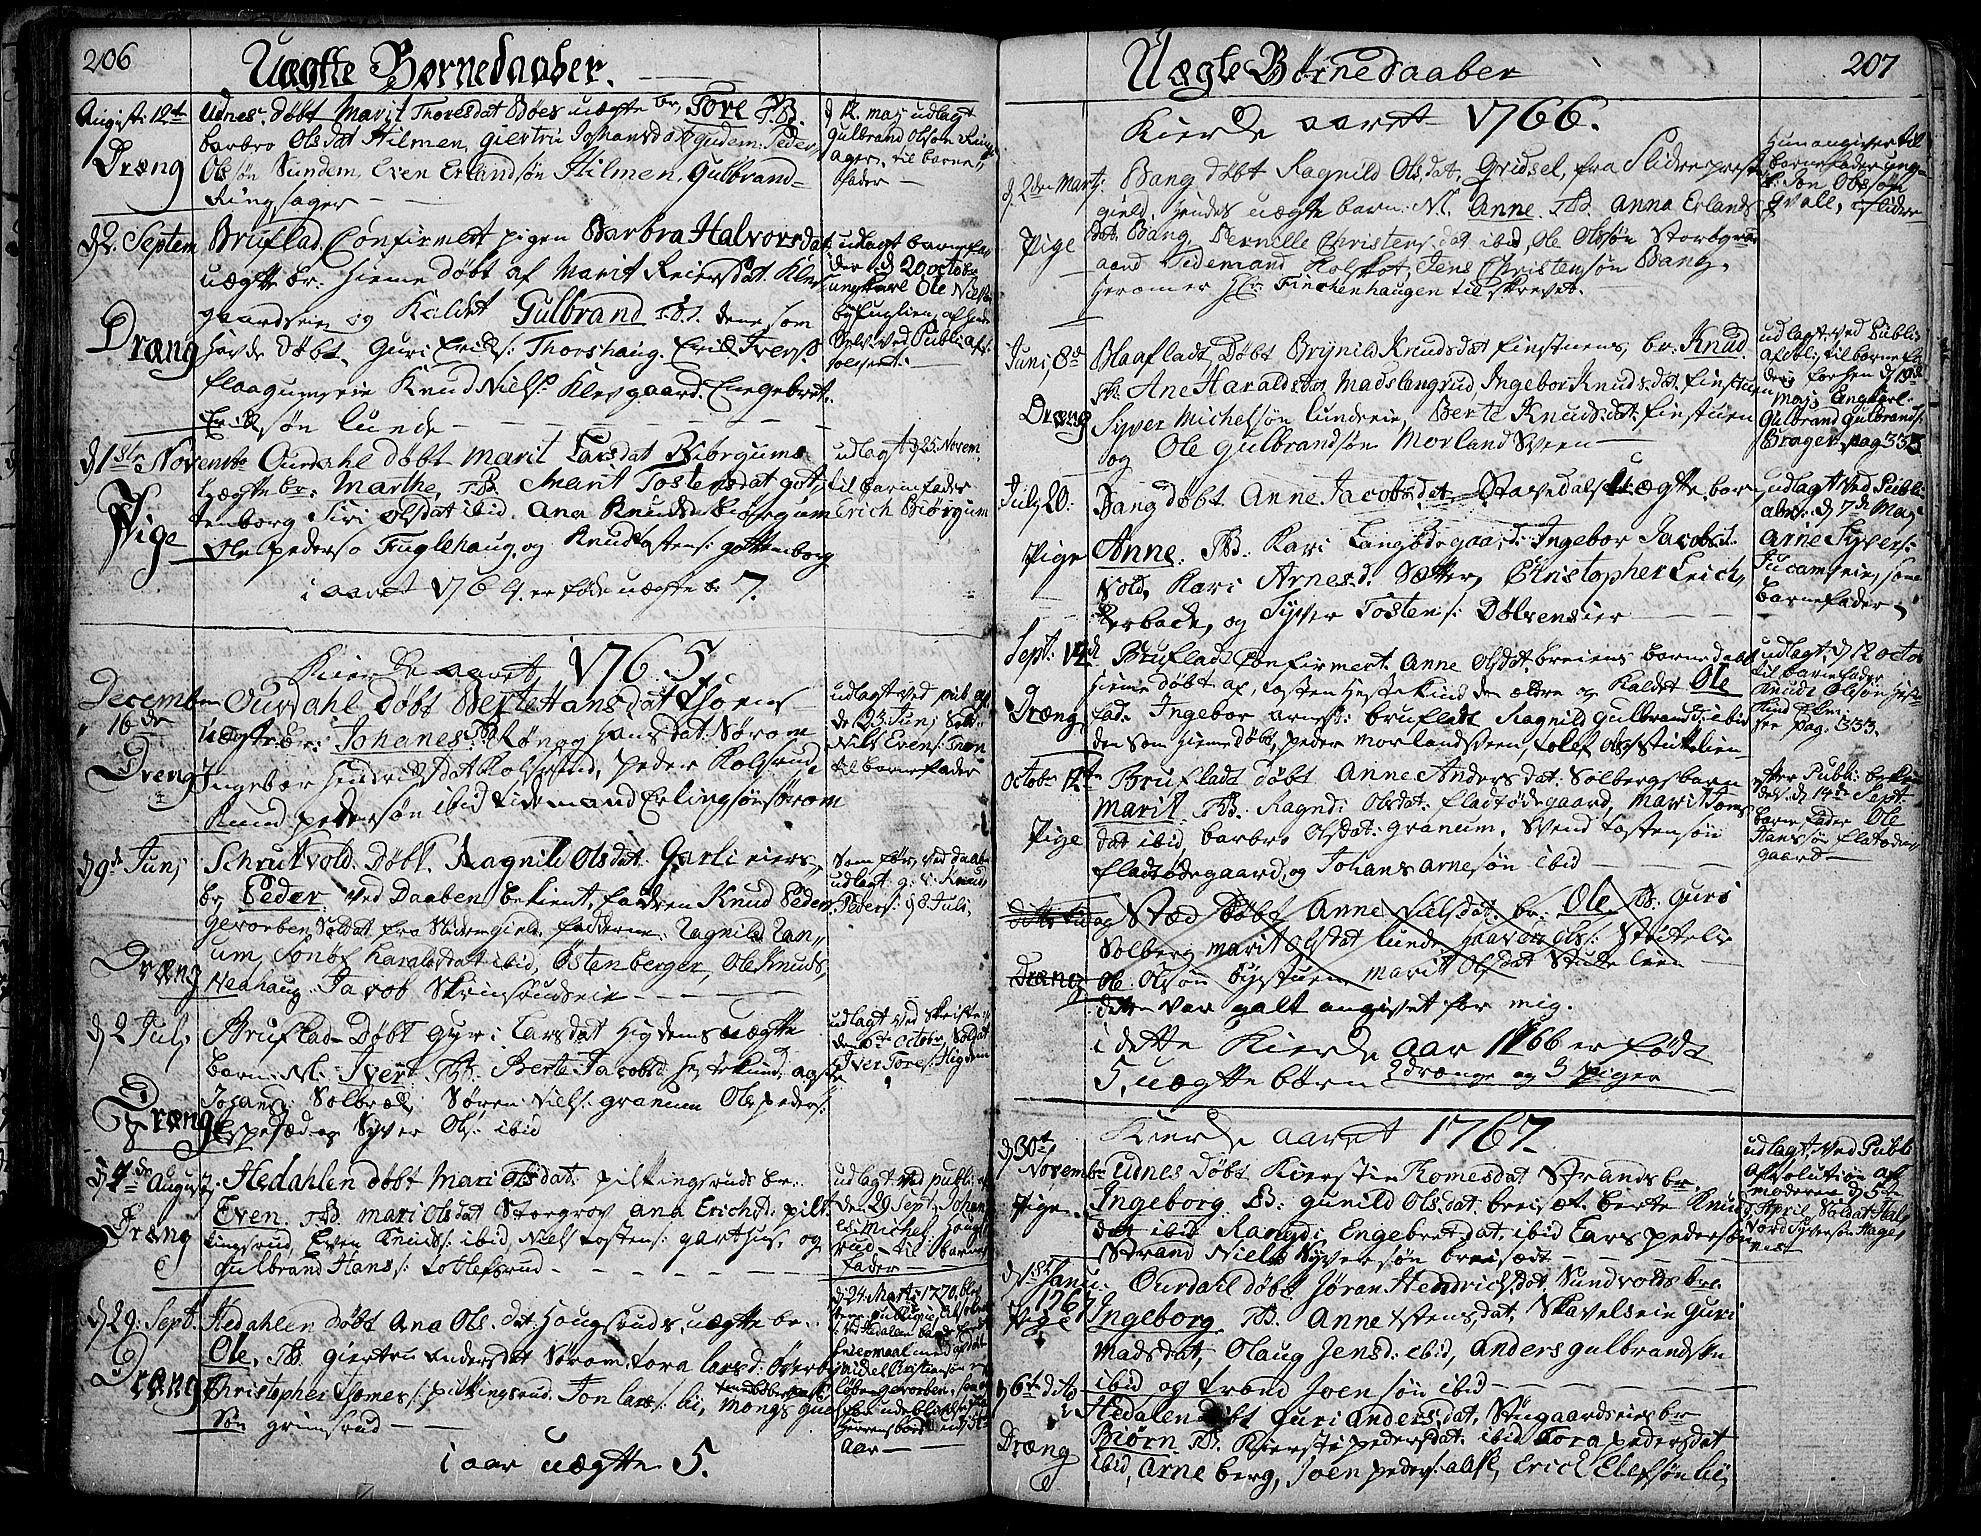 SAH, Aurdal prestekontor, Ministerialbok nr. 5, 1763-1781, s. 206-207